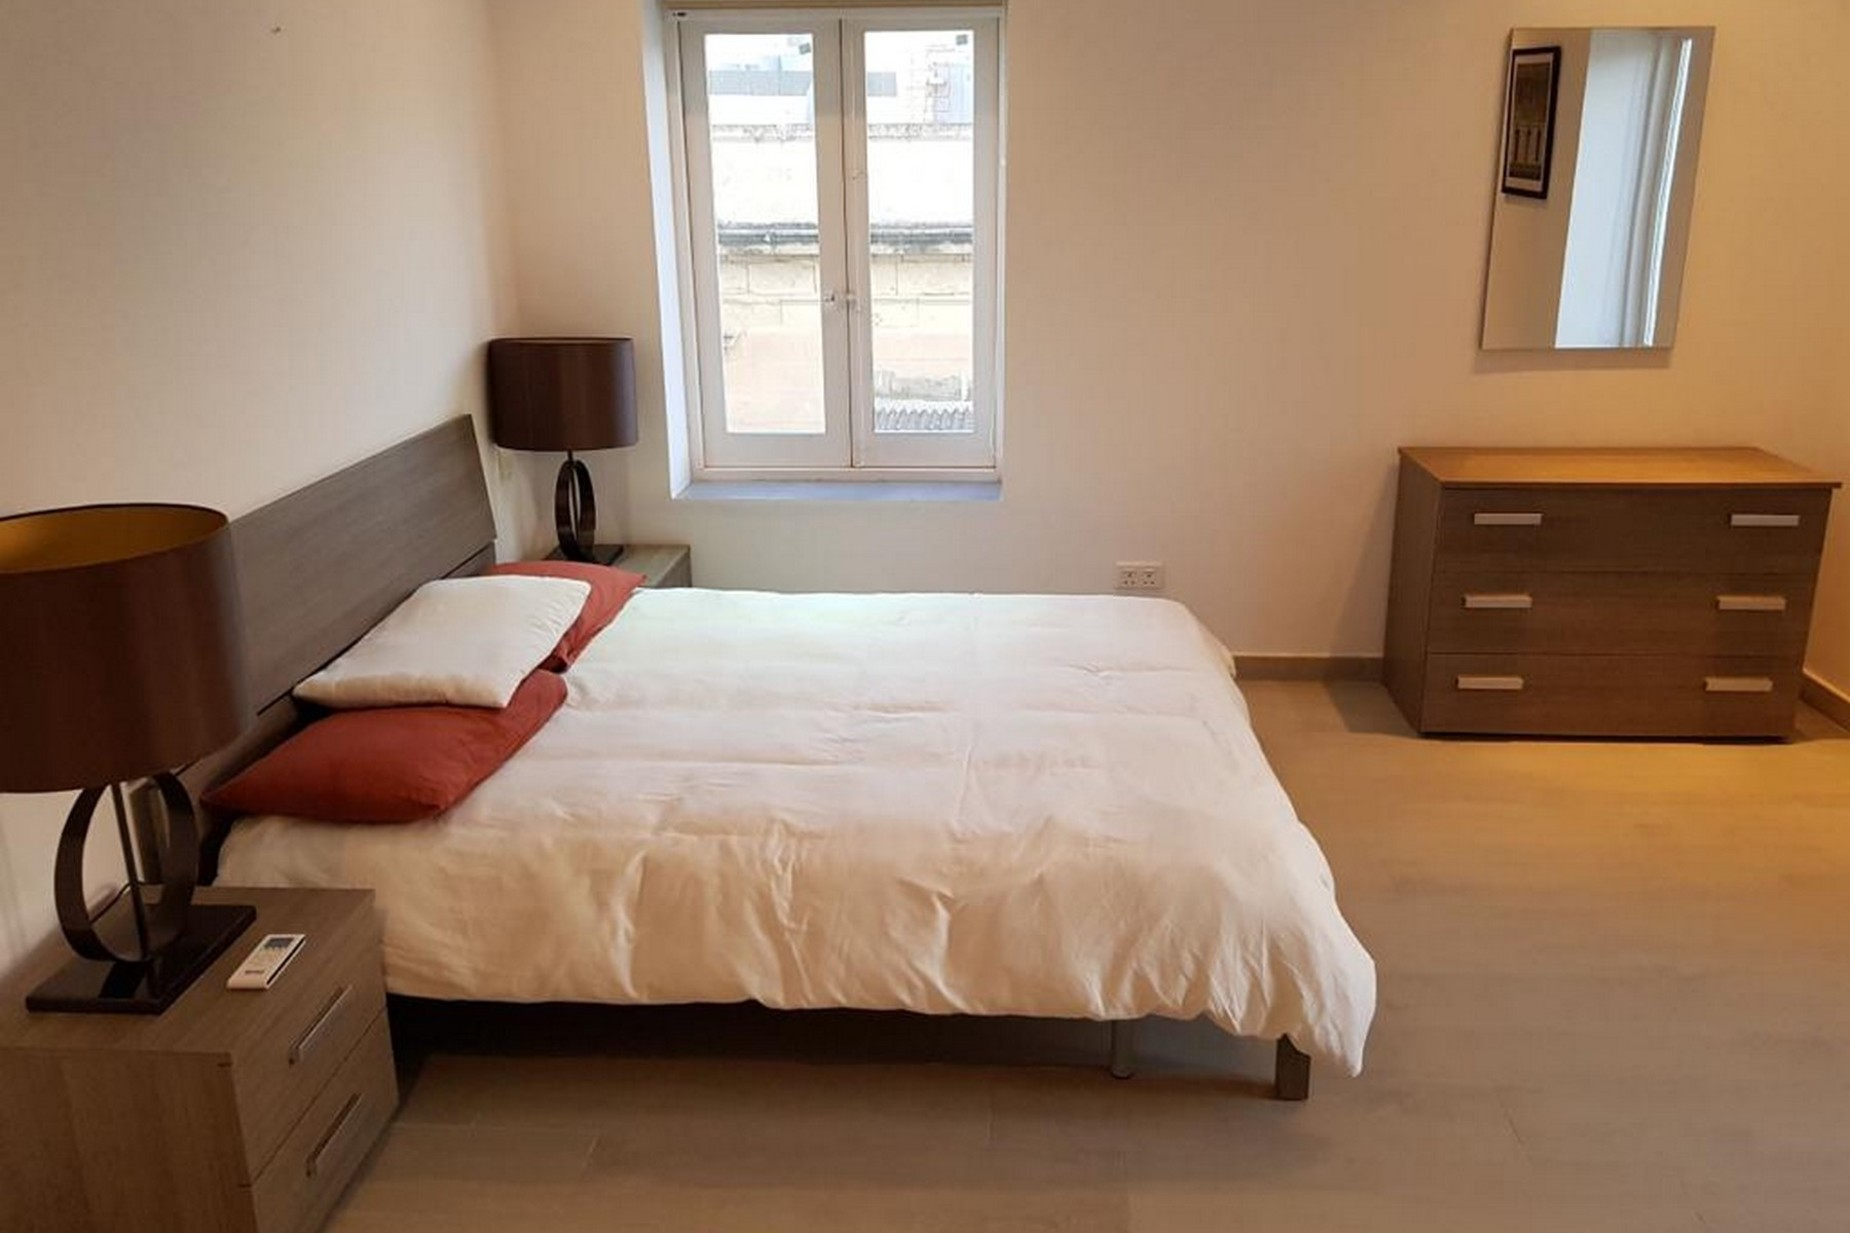 1 bed Apartment For Rent in Sliema, Sliema - thumb 7